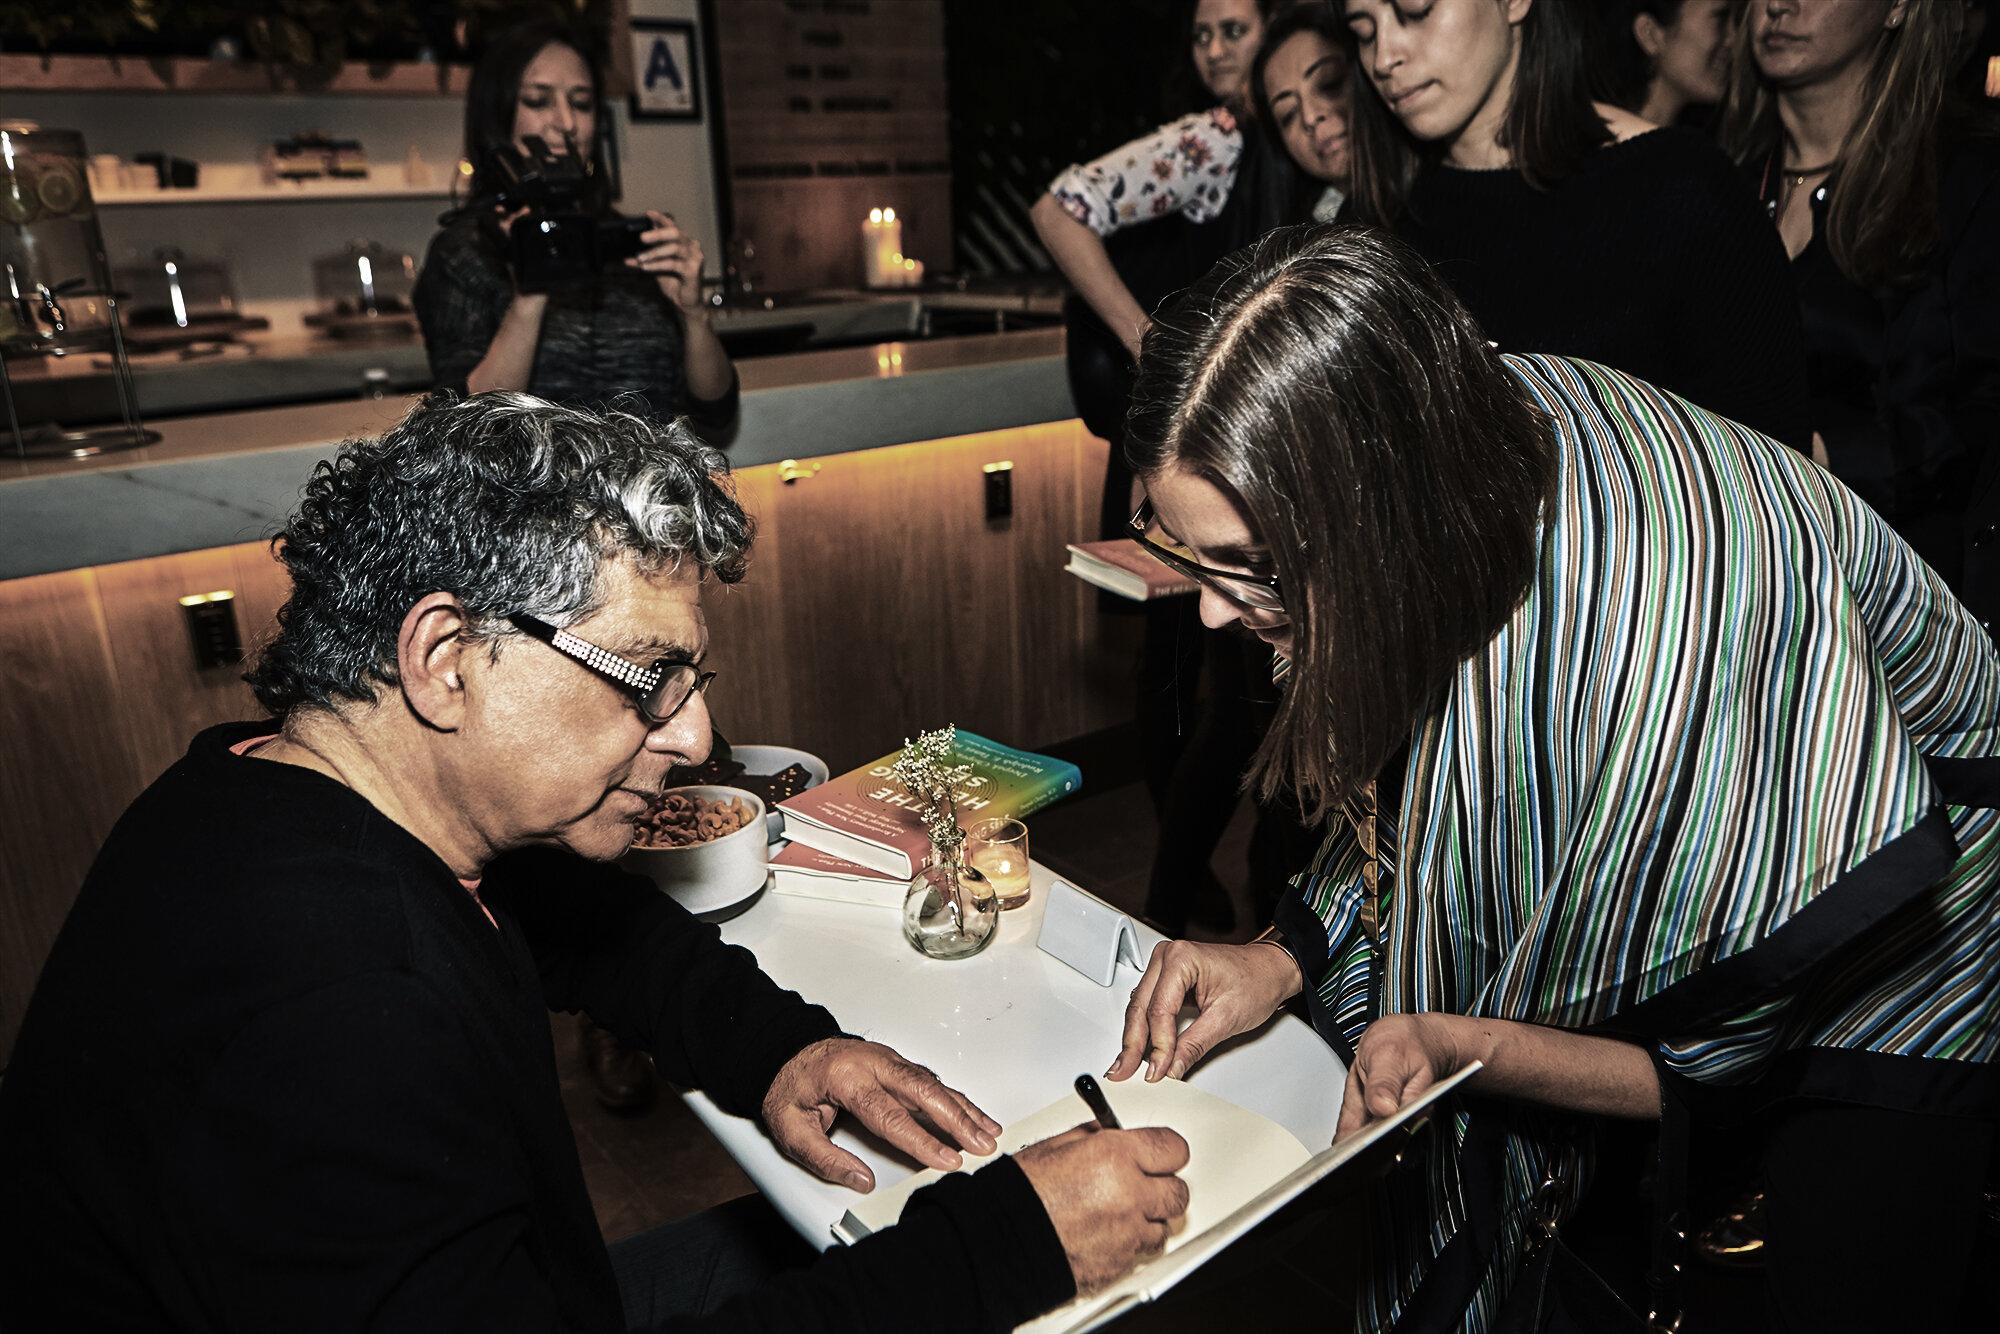 D_Chopra_LOOK_17_book_signing-034.jpg